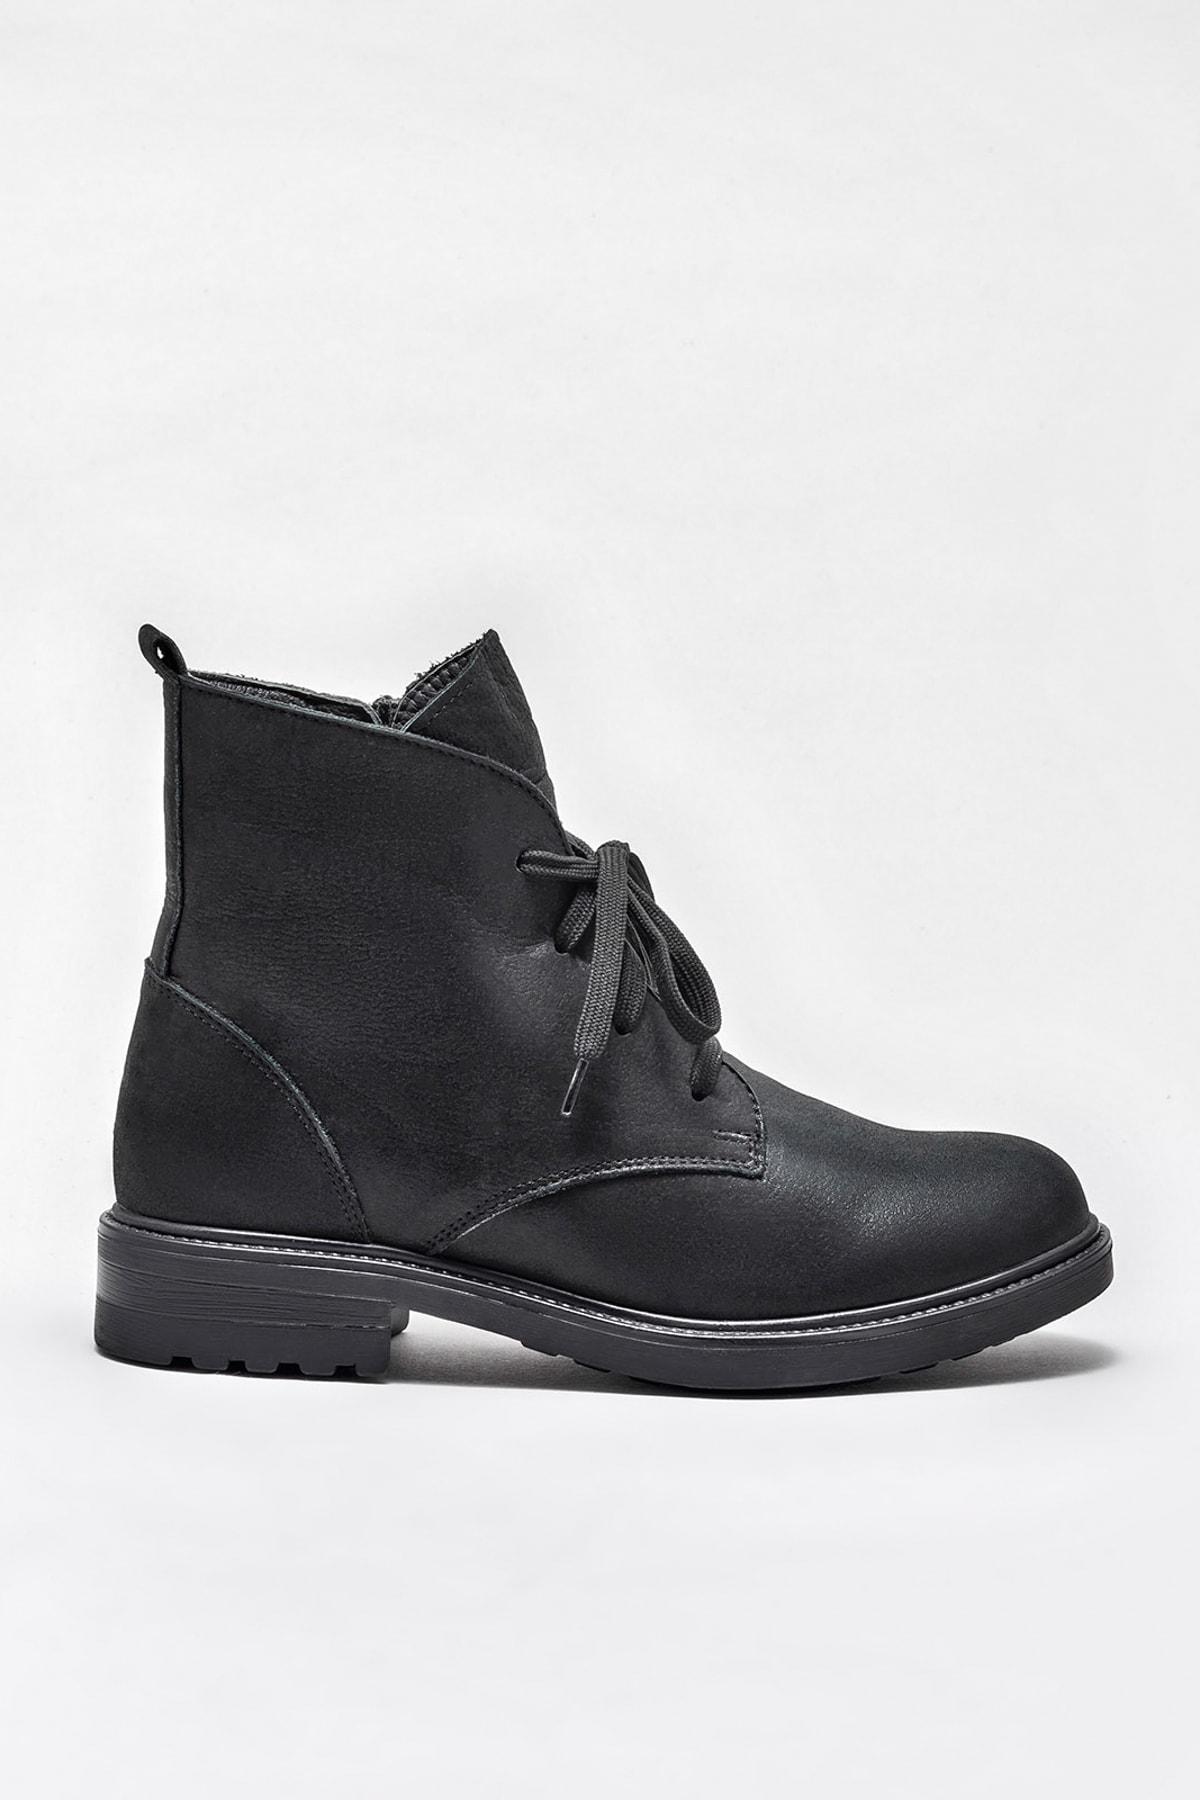 Elle Shoes MARITZA Hakiki Deri Siyah Simli Kadın Bot 1